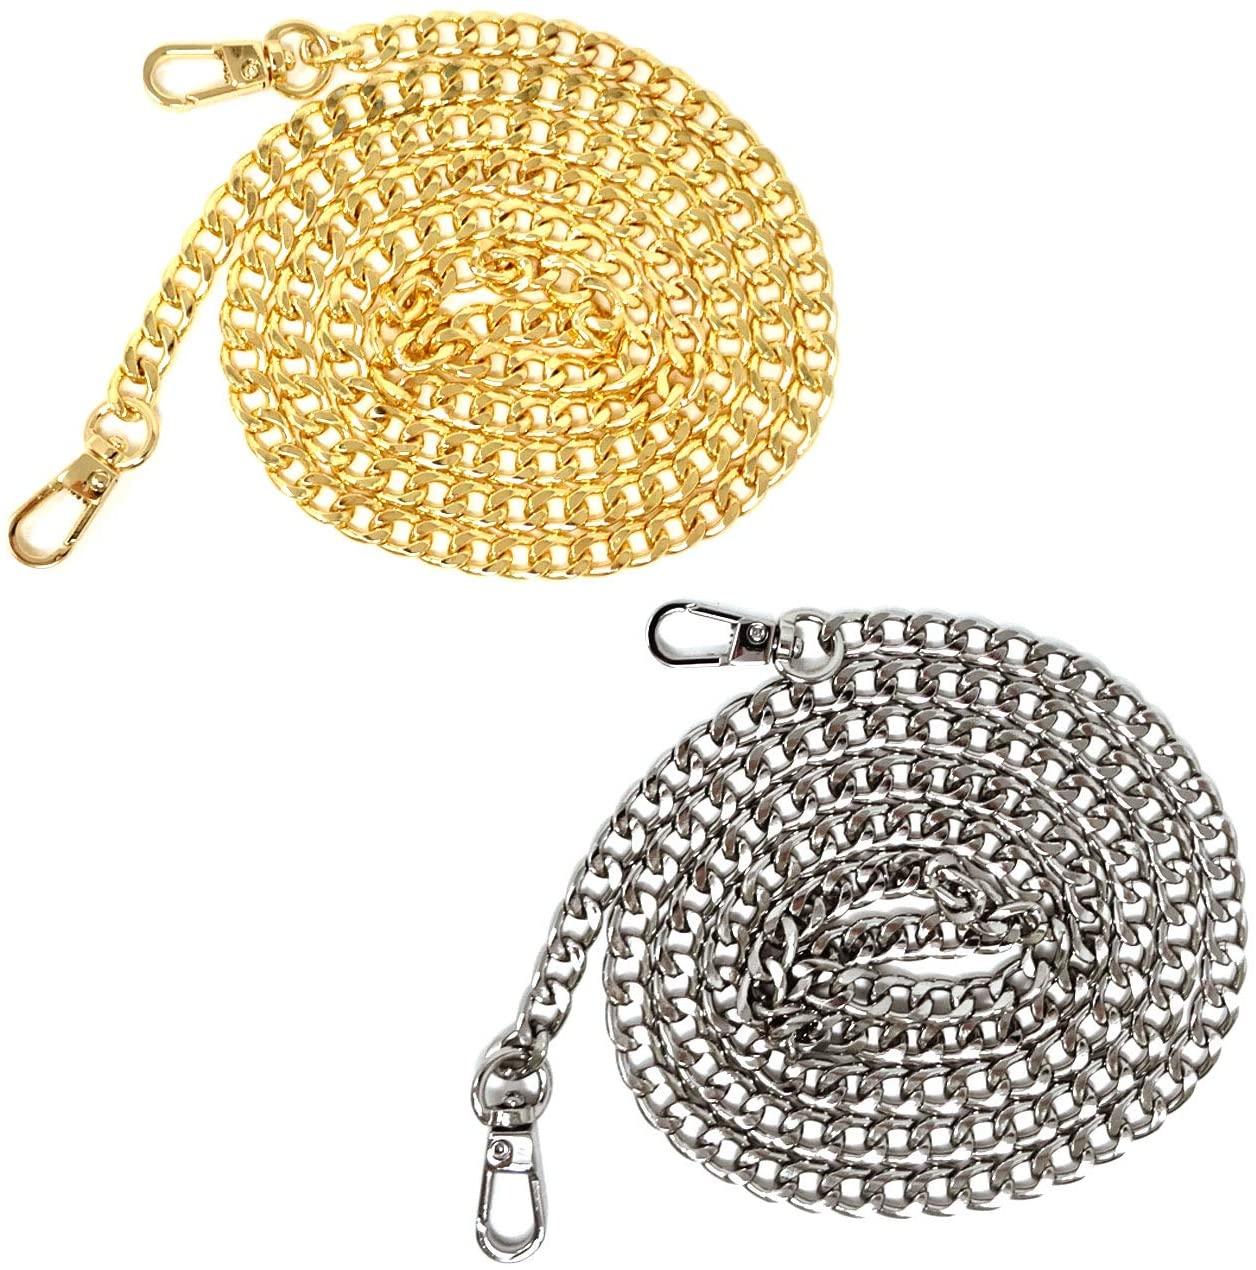 Honbay 2PCS Metal Flat Chain Straps with Buckles for DIY Shoulder Cross Body Bag Handbag Purse Replacement